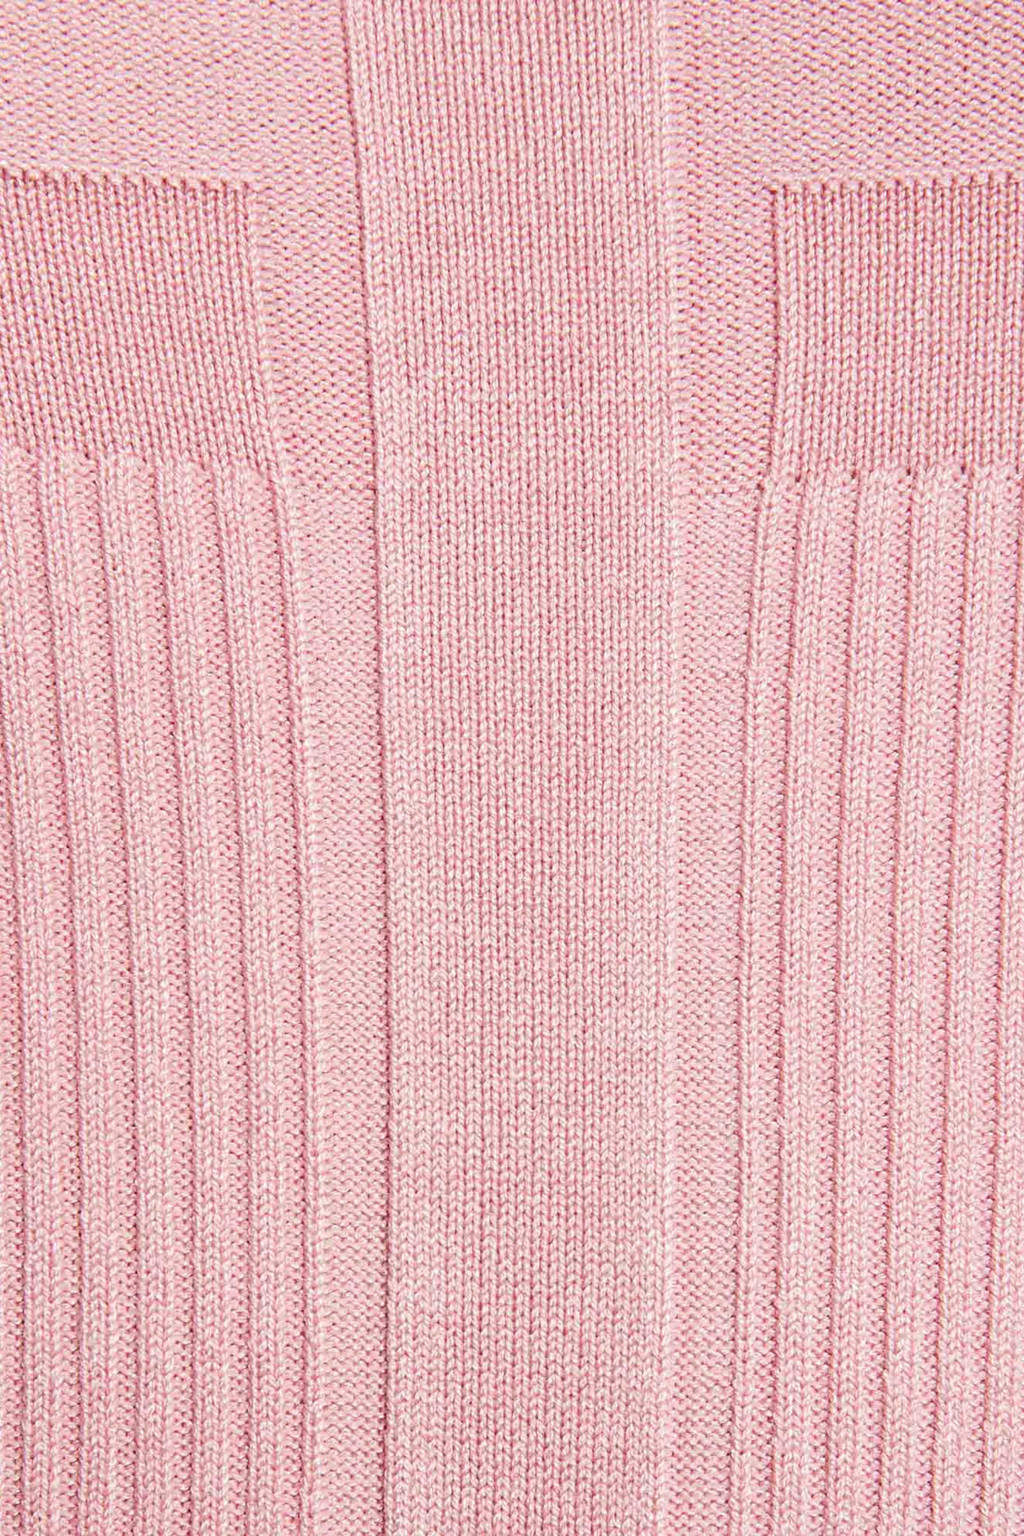 Morgan coltrui roze, Lichtroze